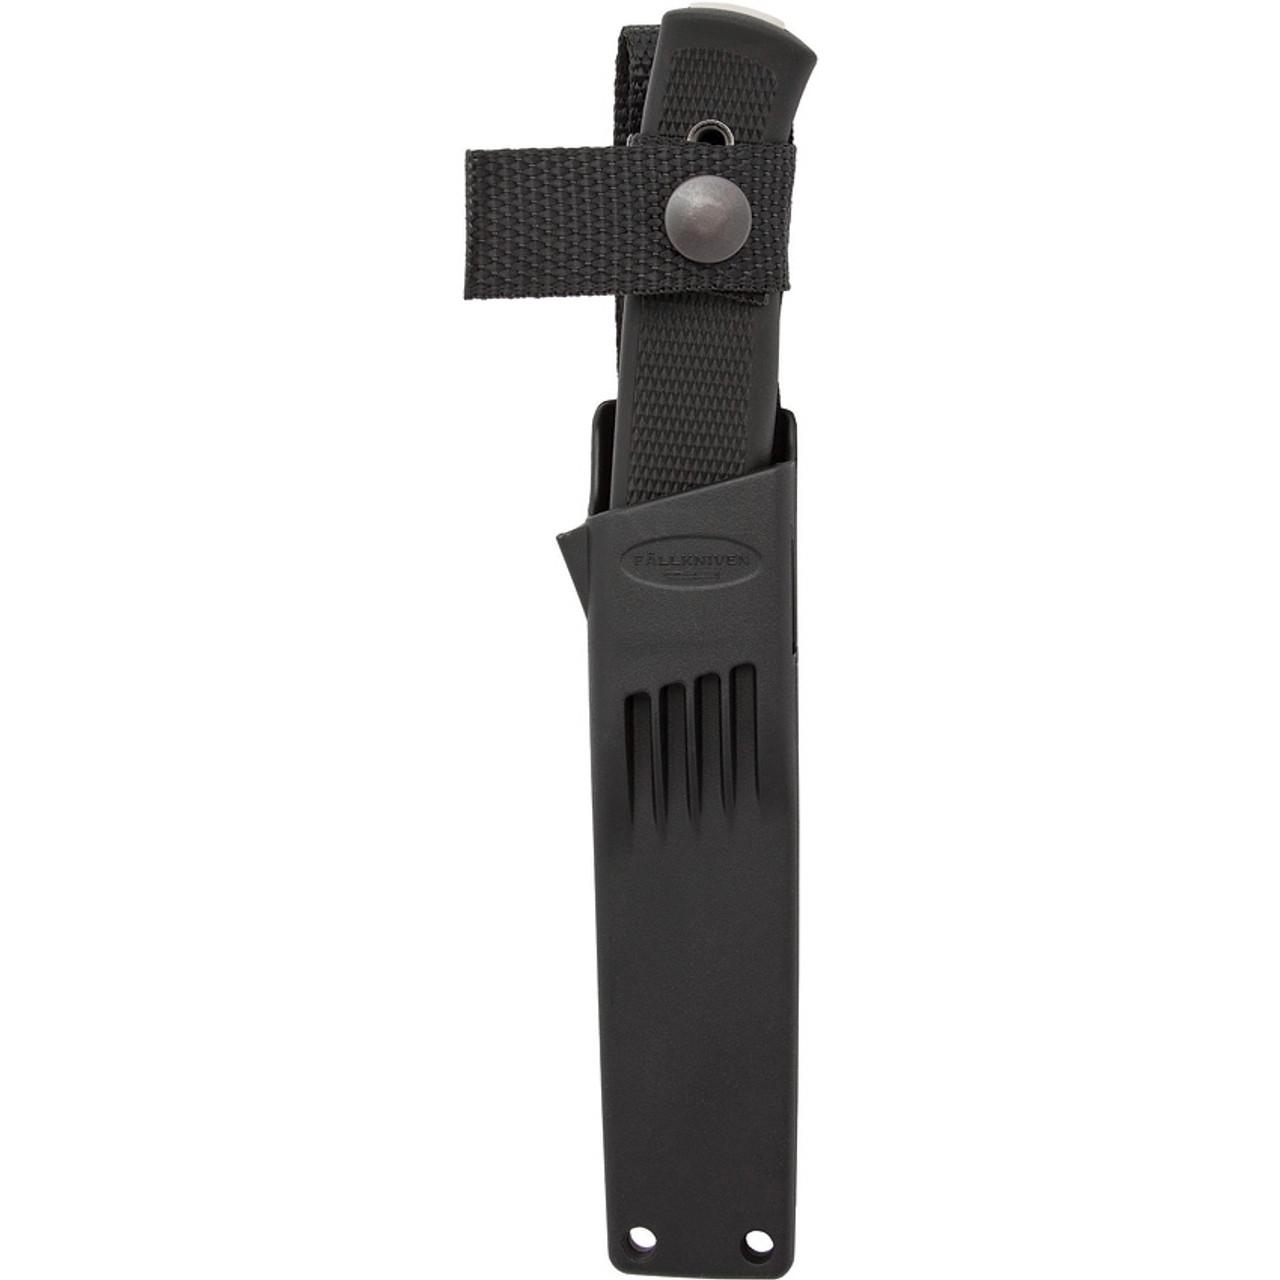 "Fallkniven F1BZ Military Survival Left Hand Sheath, 3.8"" Laminated VG10 Black Plain Blade, Thermorun Handle"